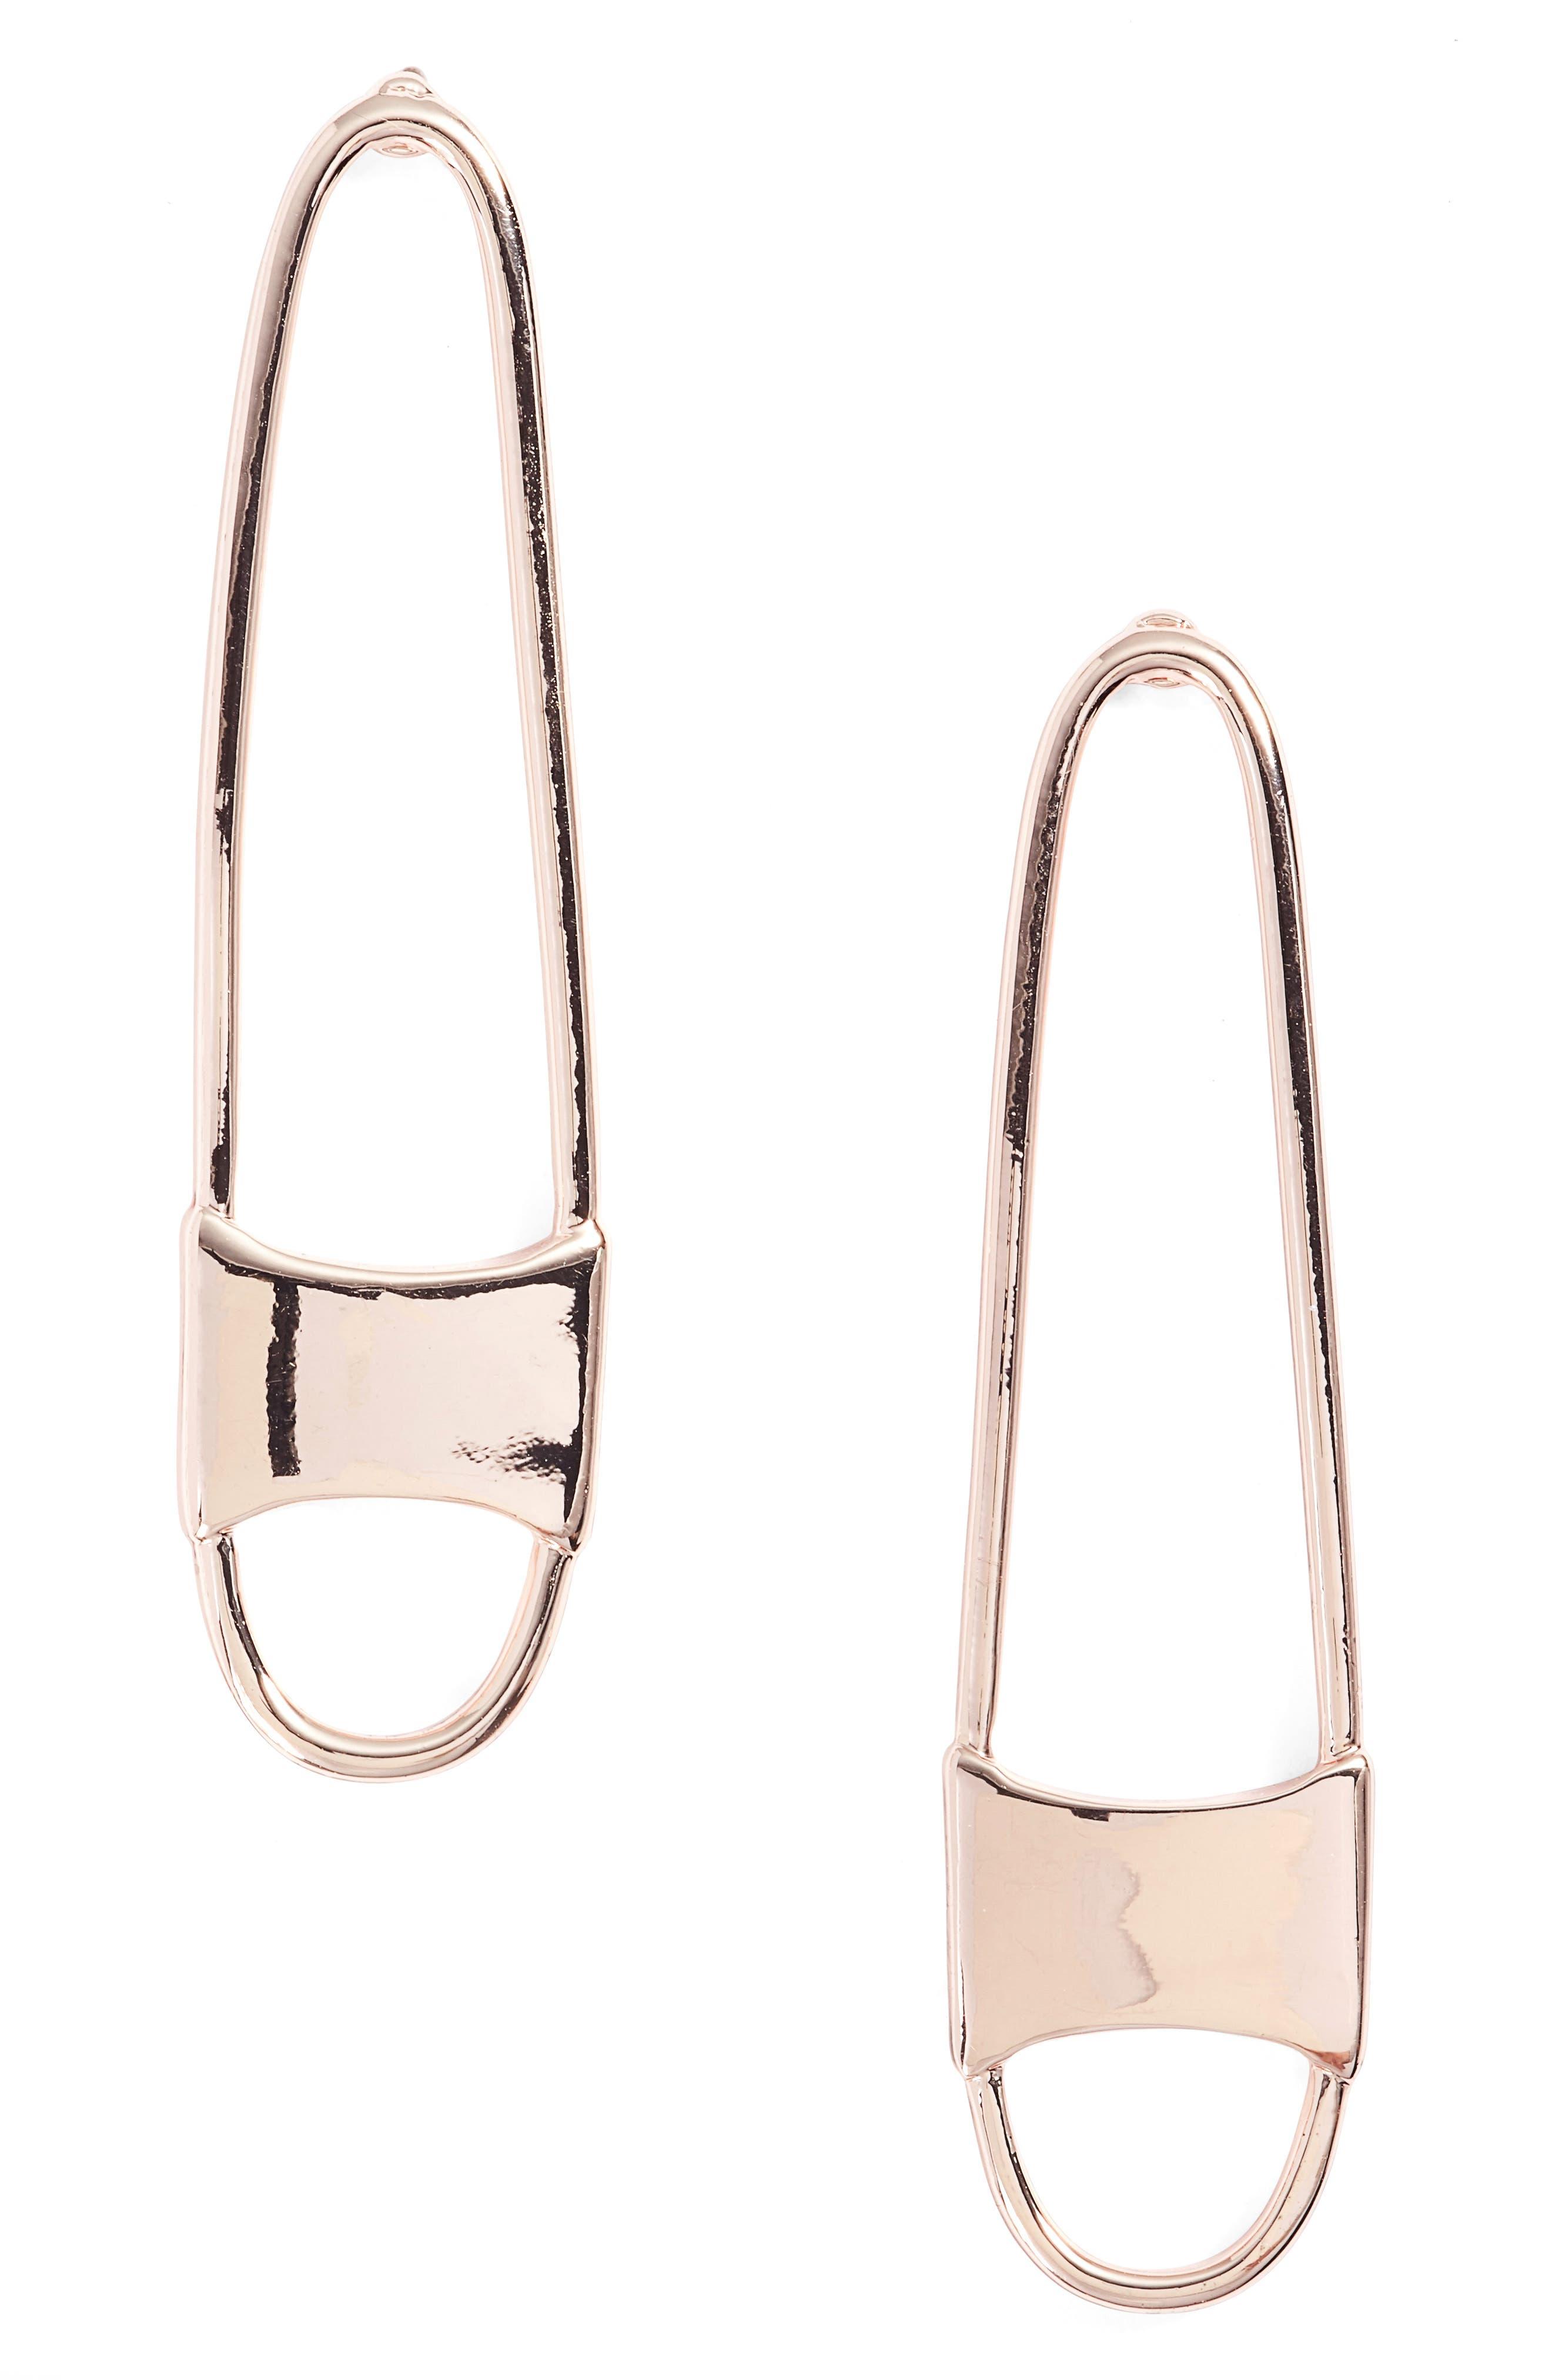 Main Image - Rebecca Minkoff Runway Pin Drop Earrings